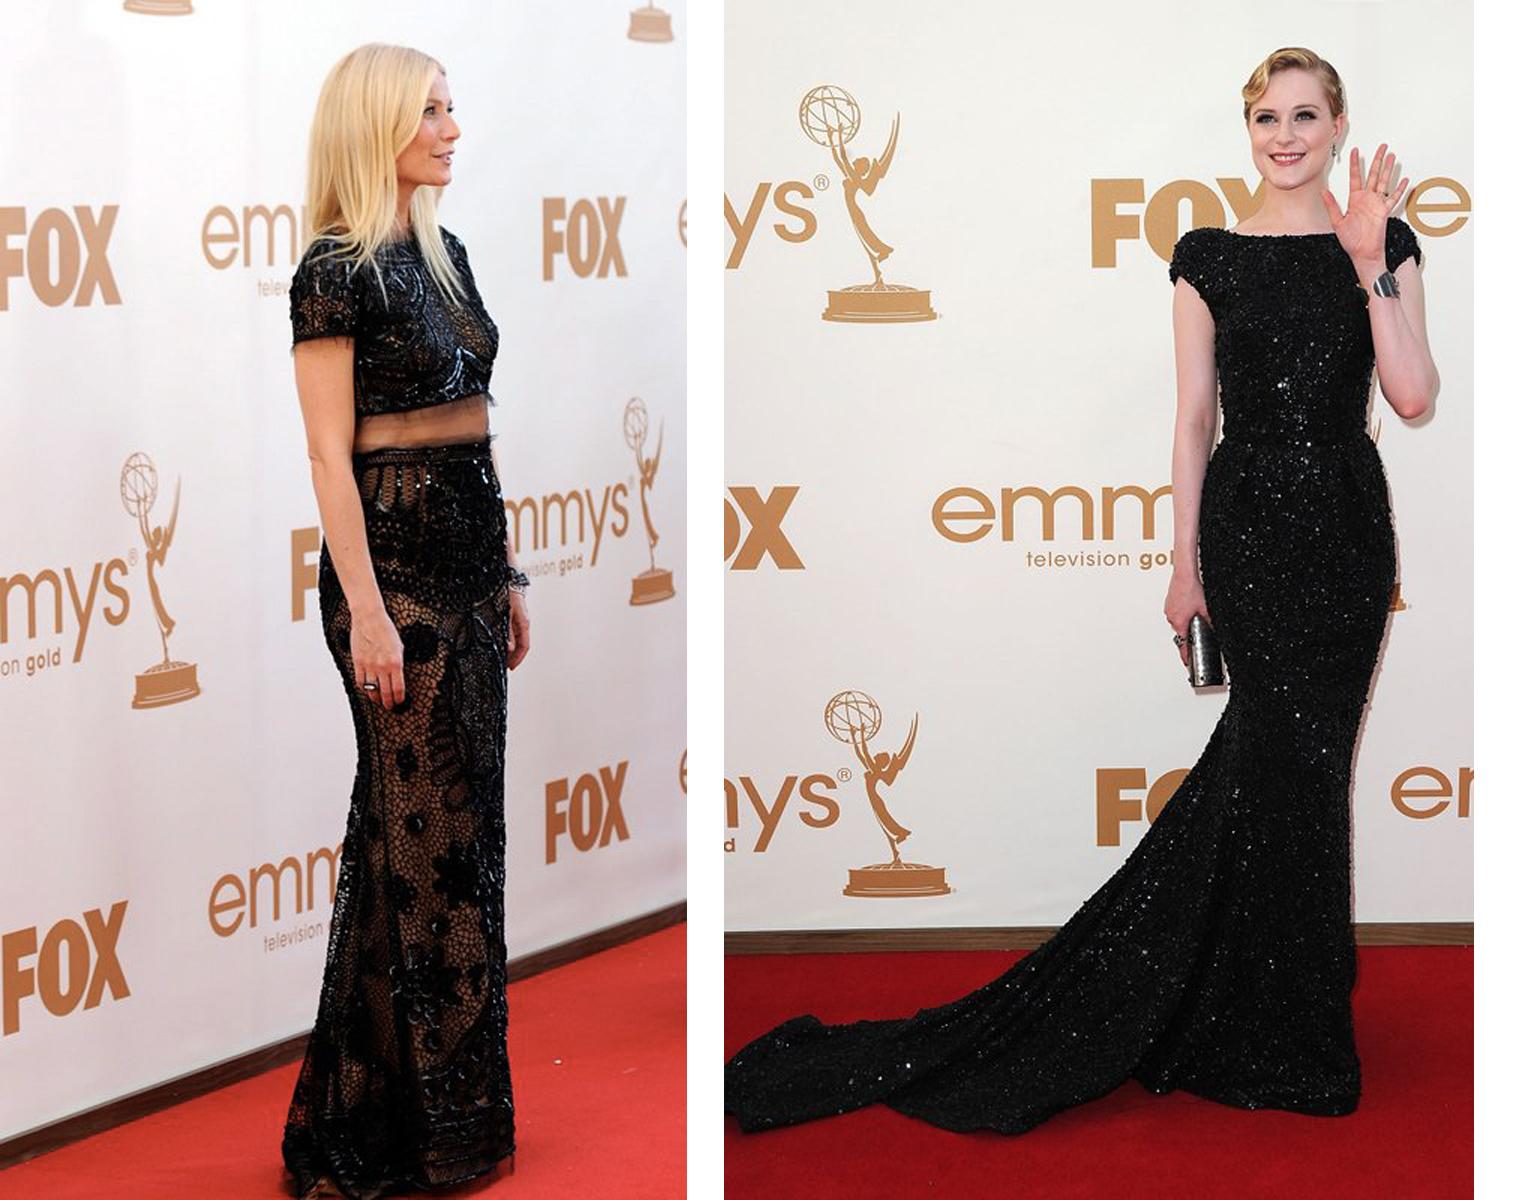 http://1.bp.blogspot.com/-wE6XJrGaCnE/Tnacd0kuUfI/AAAAAAAAEMQ/zsMAcyVUJVI/s1600/Emmys+black.jpg